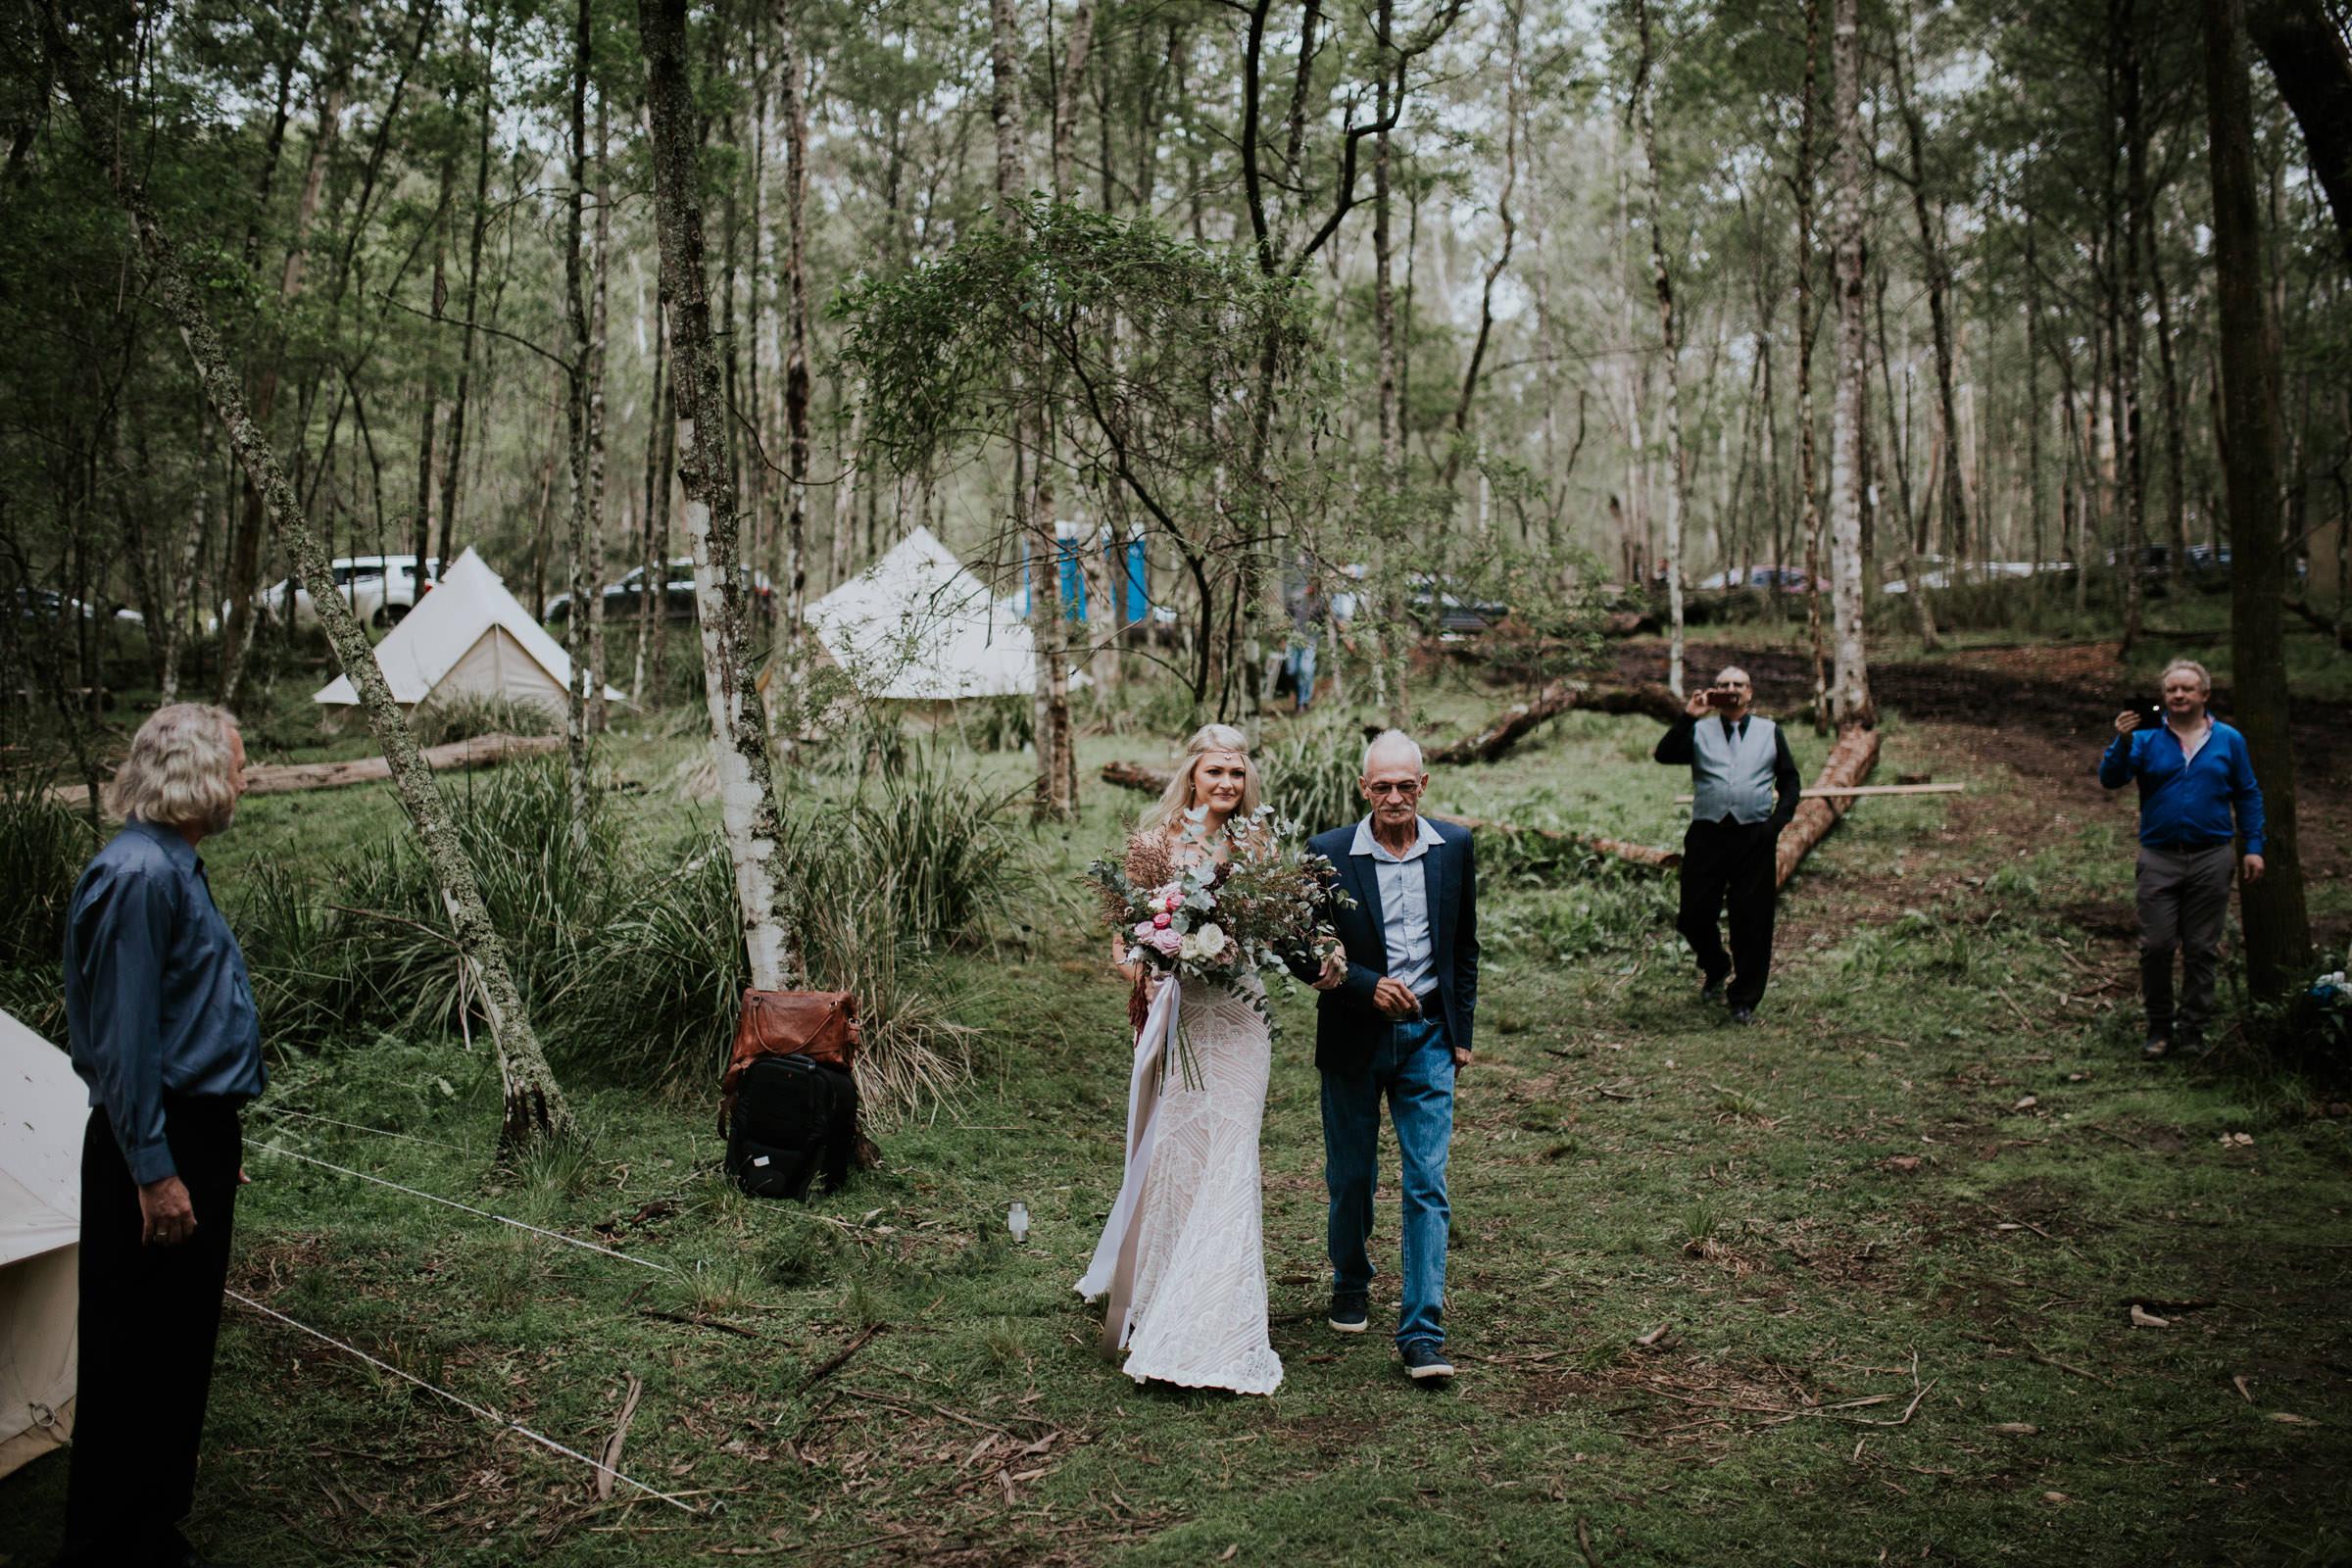 Emma+John+Far+South+Coast+Wedding+Festivl+Glamping+Bush-95.jpg